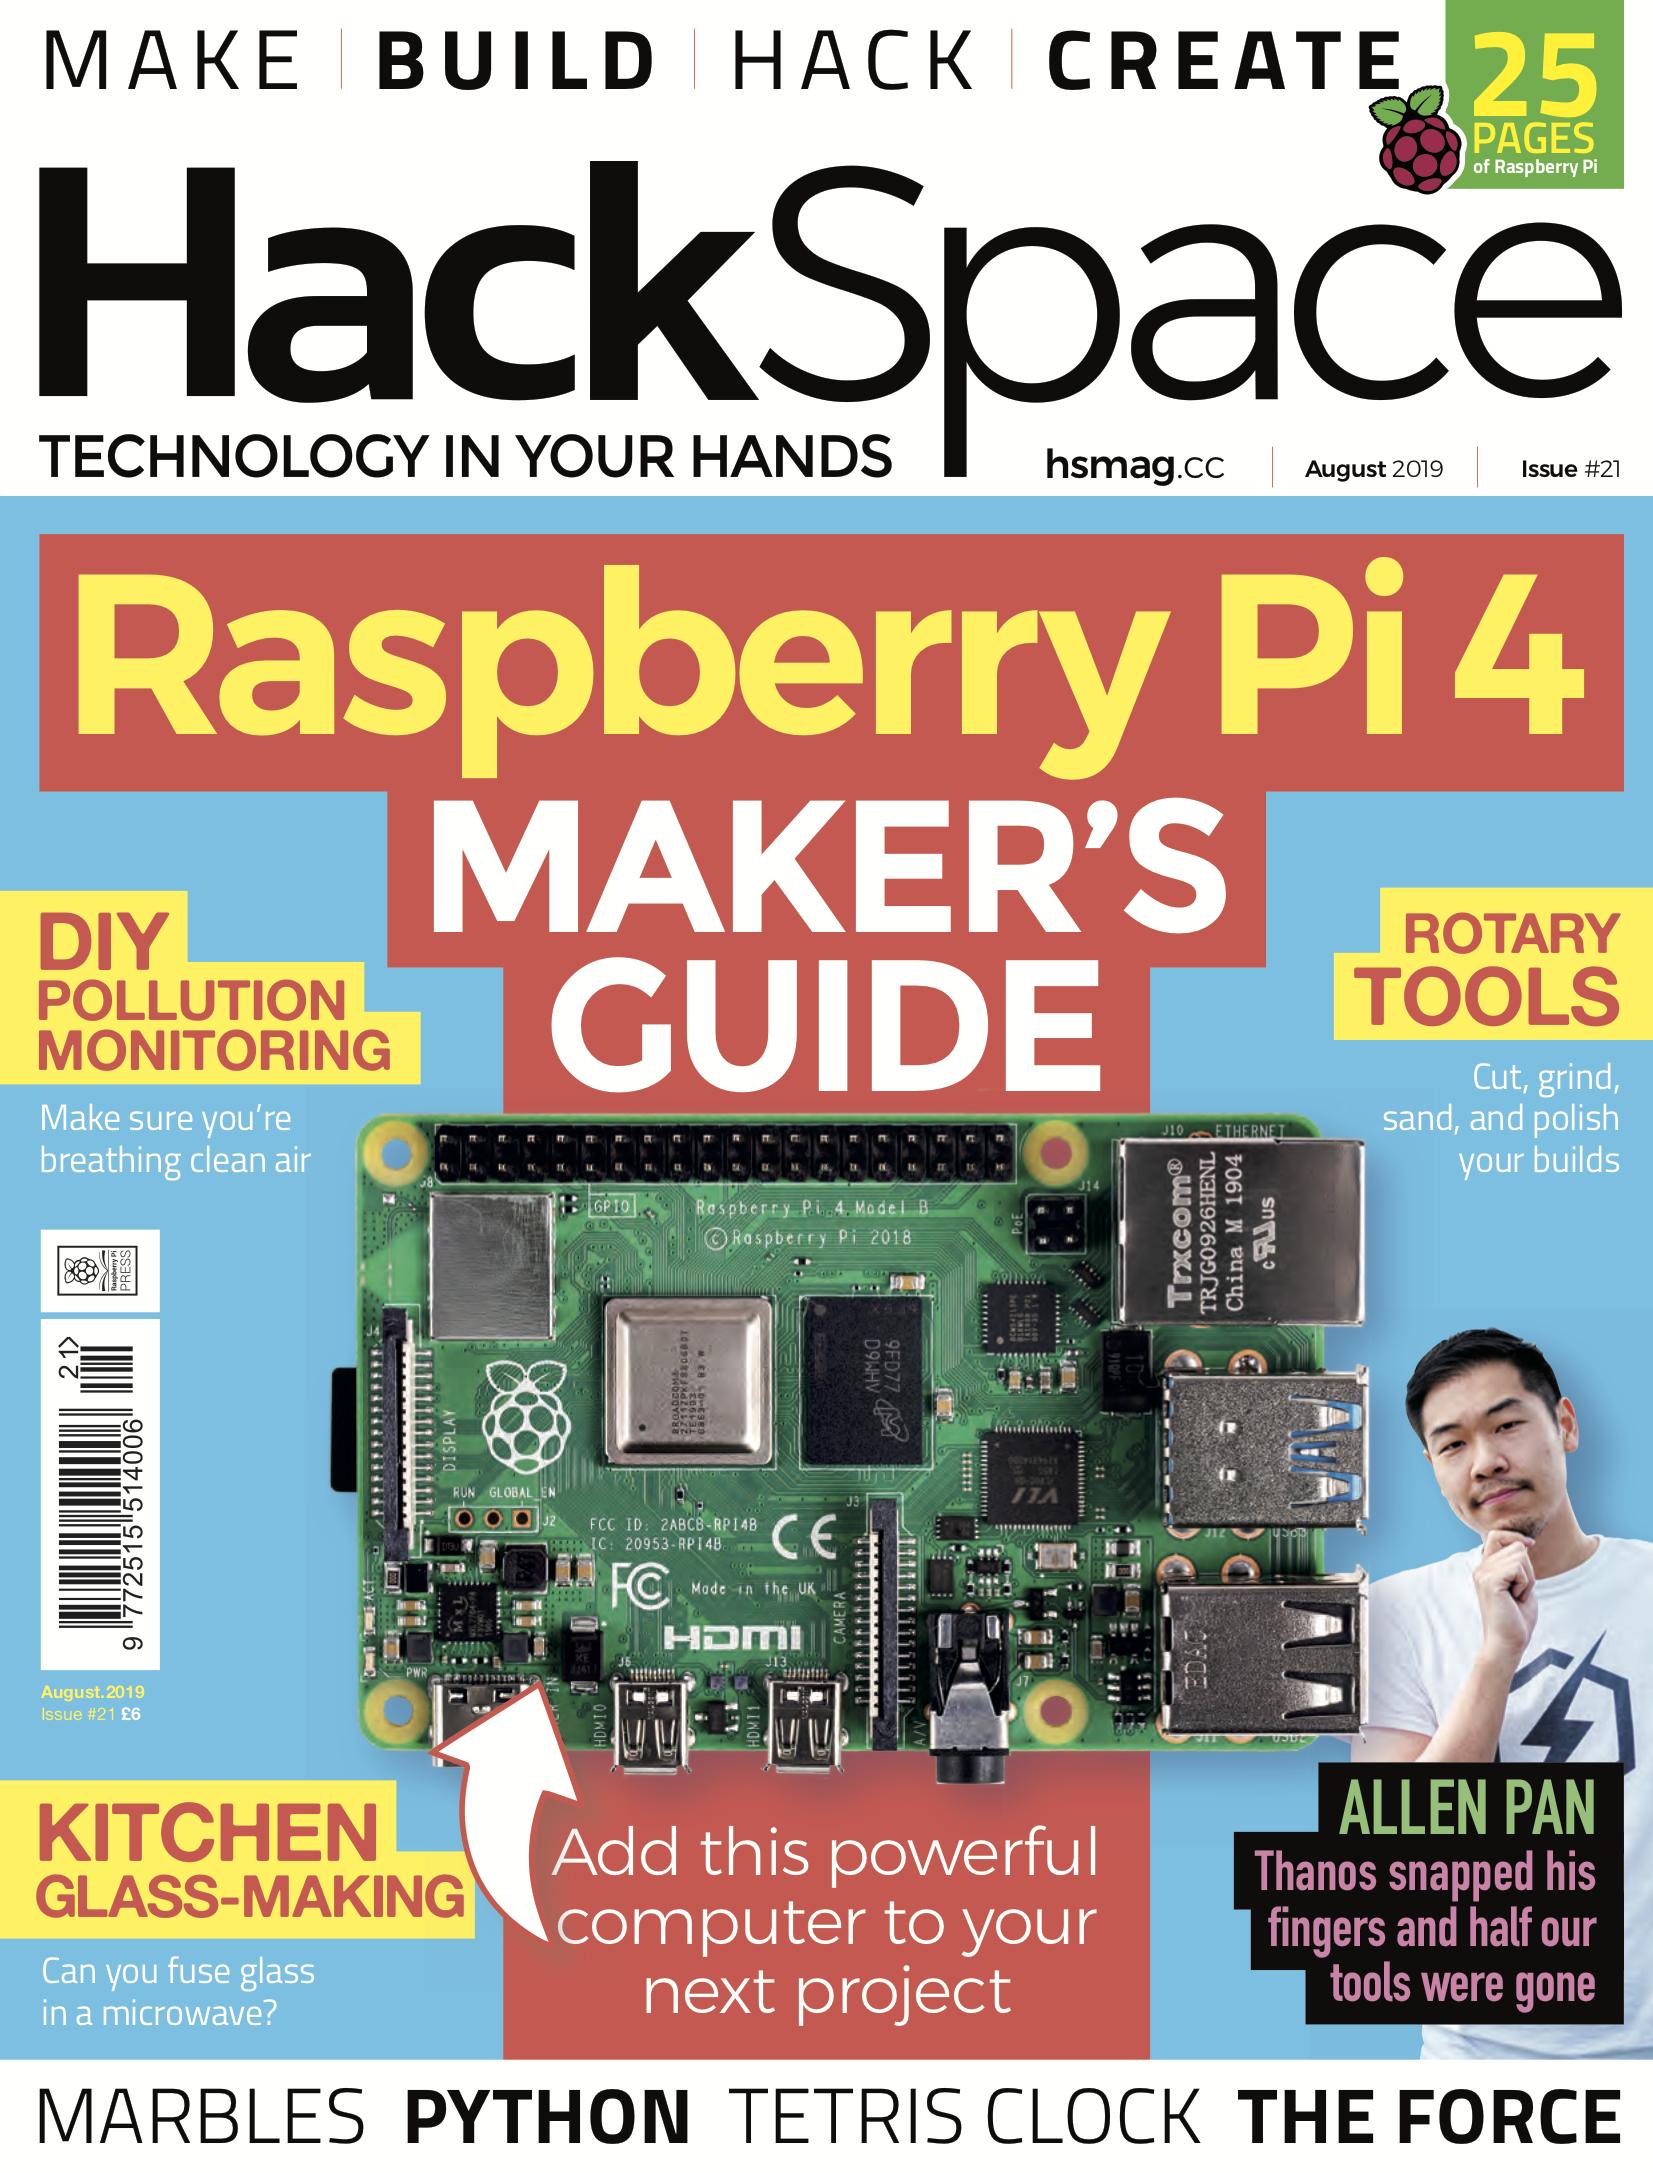 Monitor air quality with a Raspberry Pi - Raspberry Pi